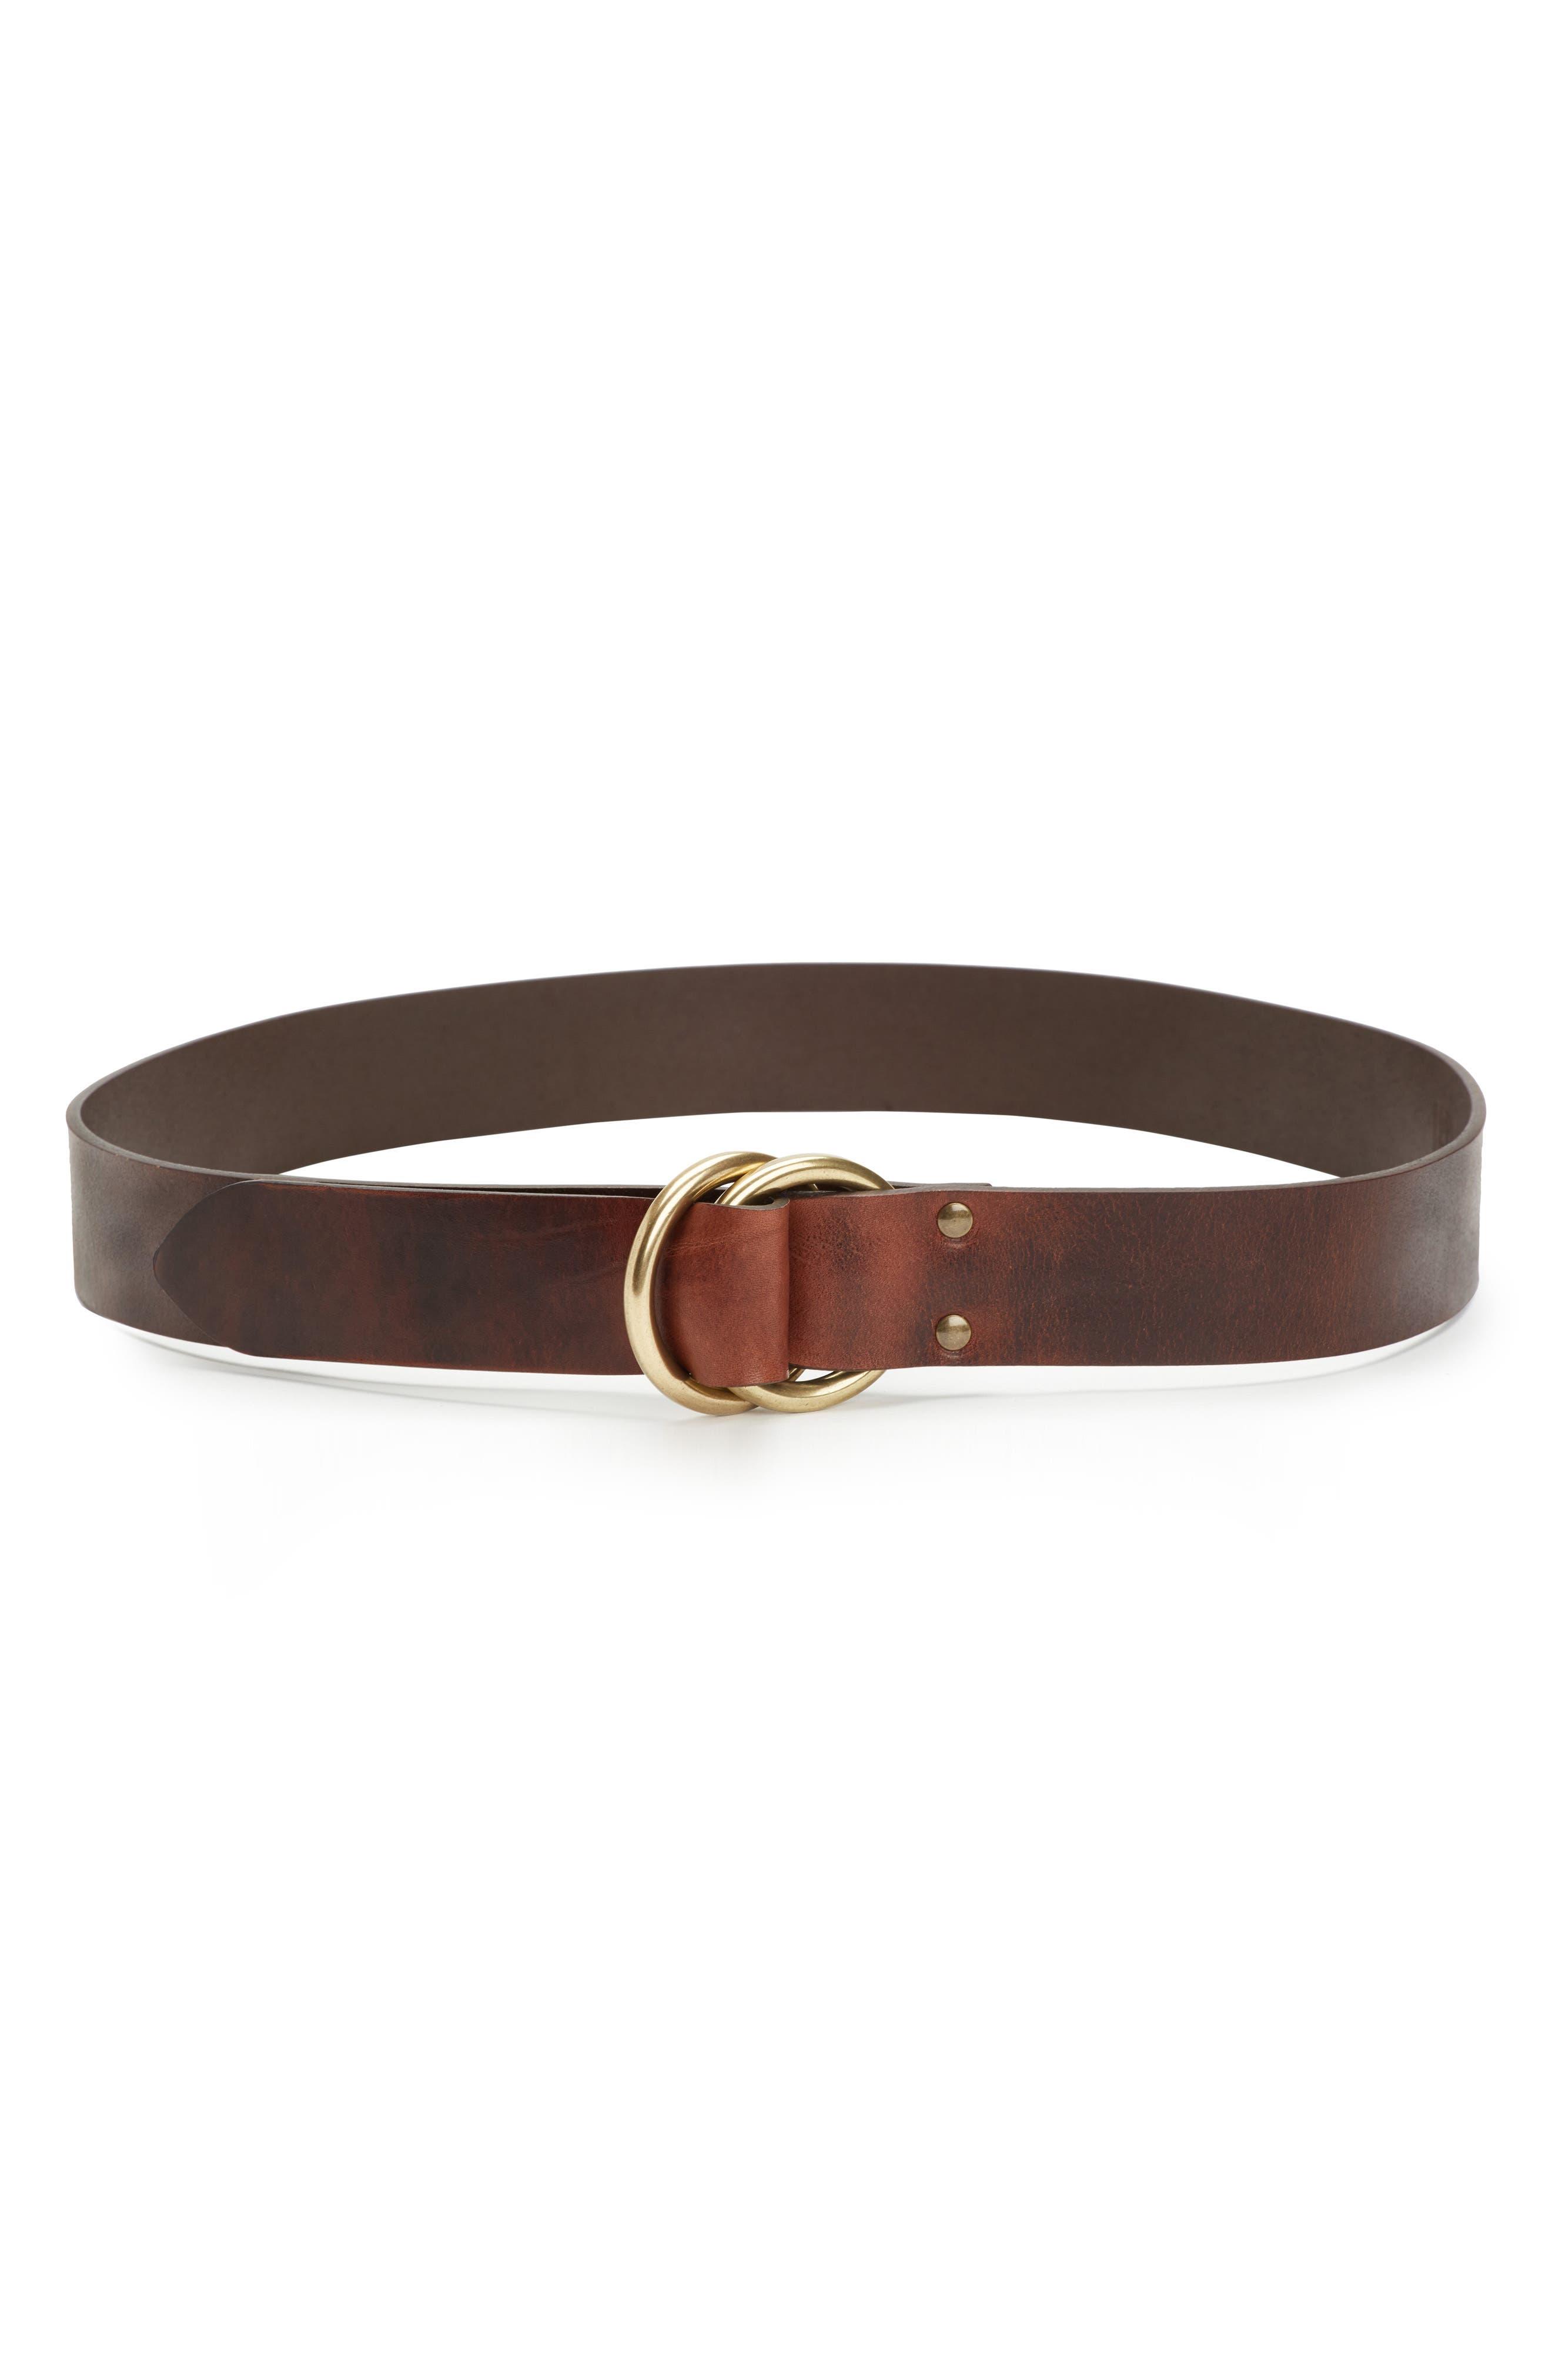 Main Image - Frye Harness Leather Belt